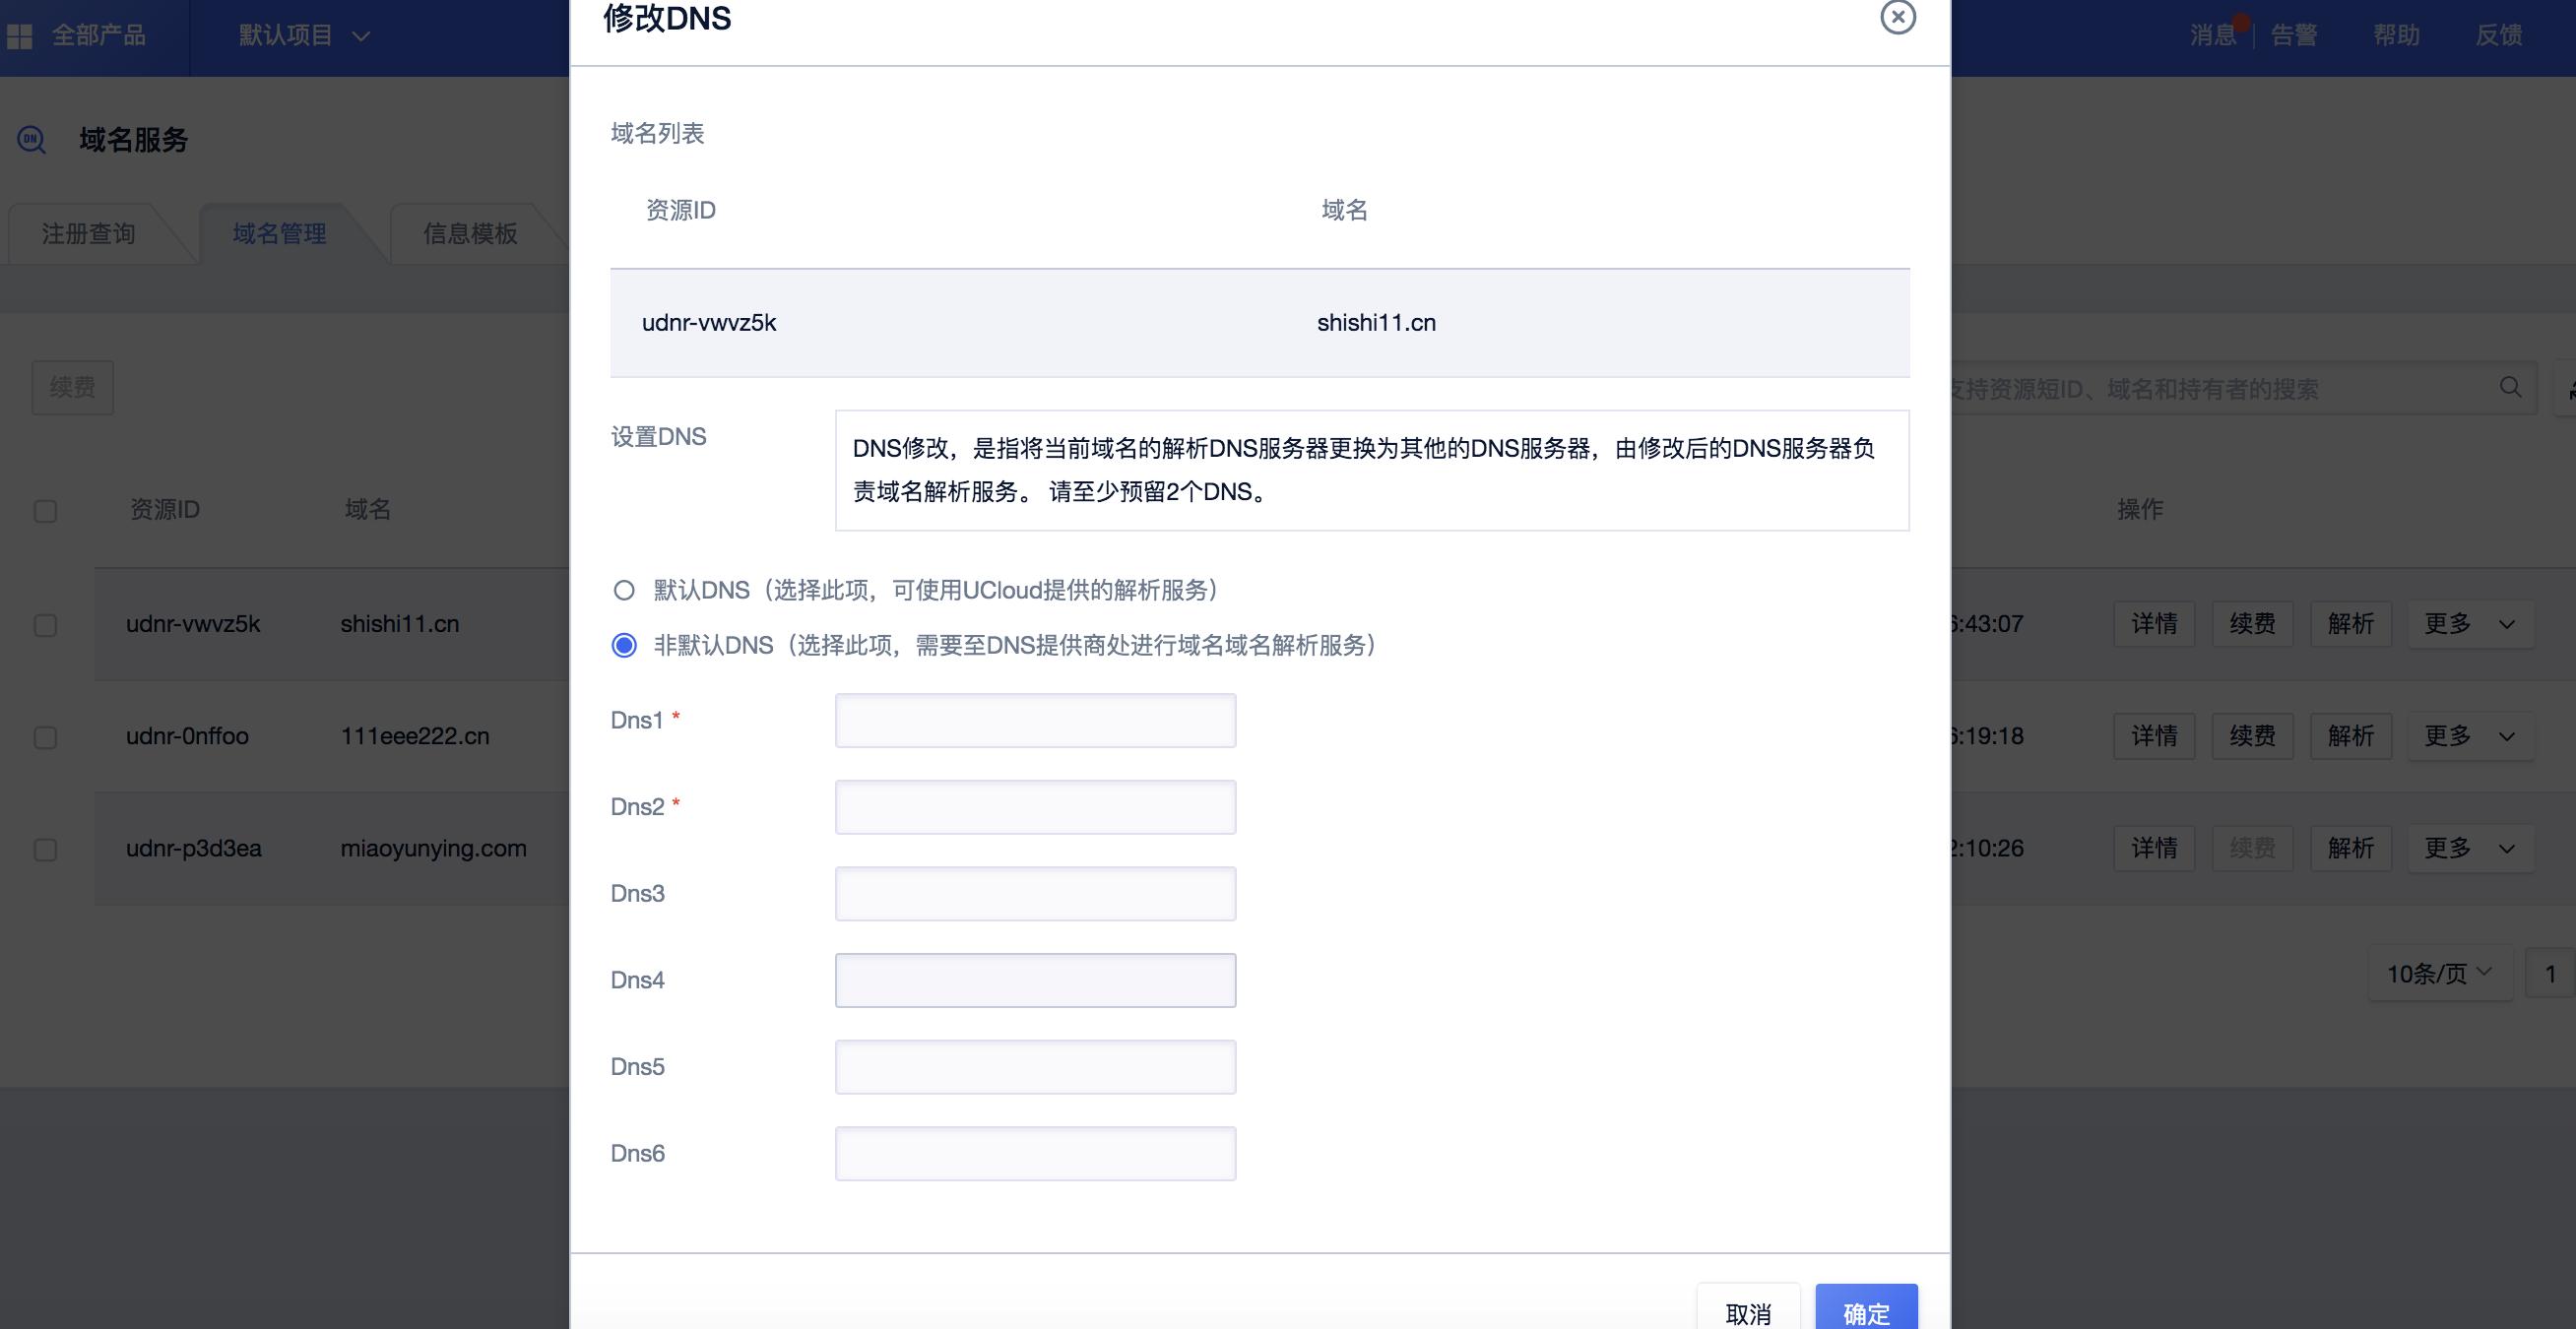 UCloud云平台上域名DNS配置